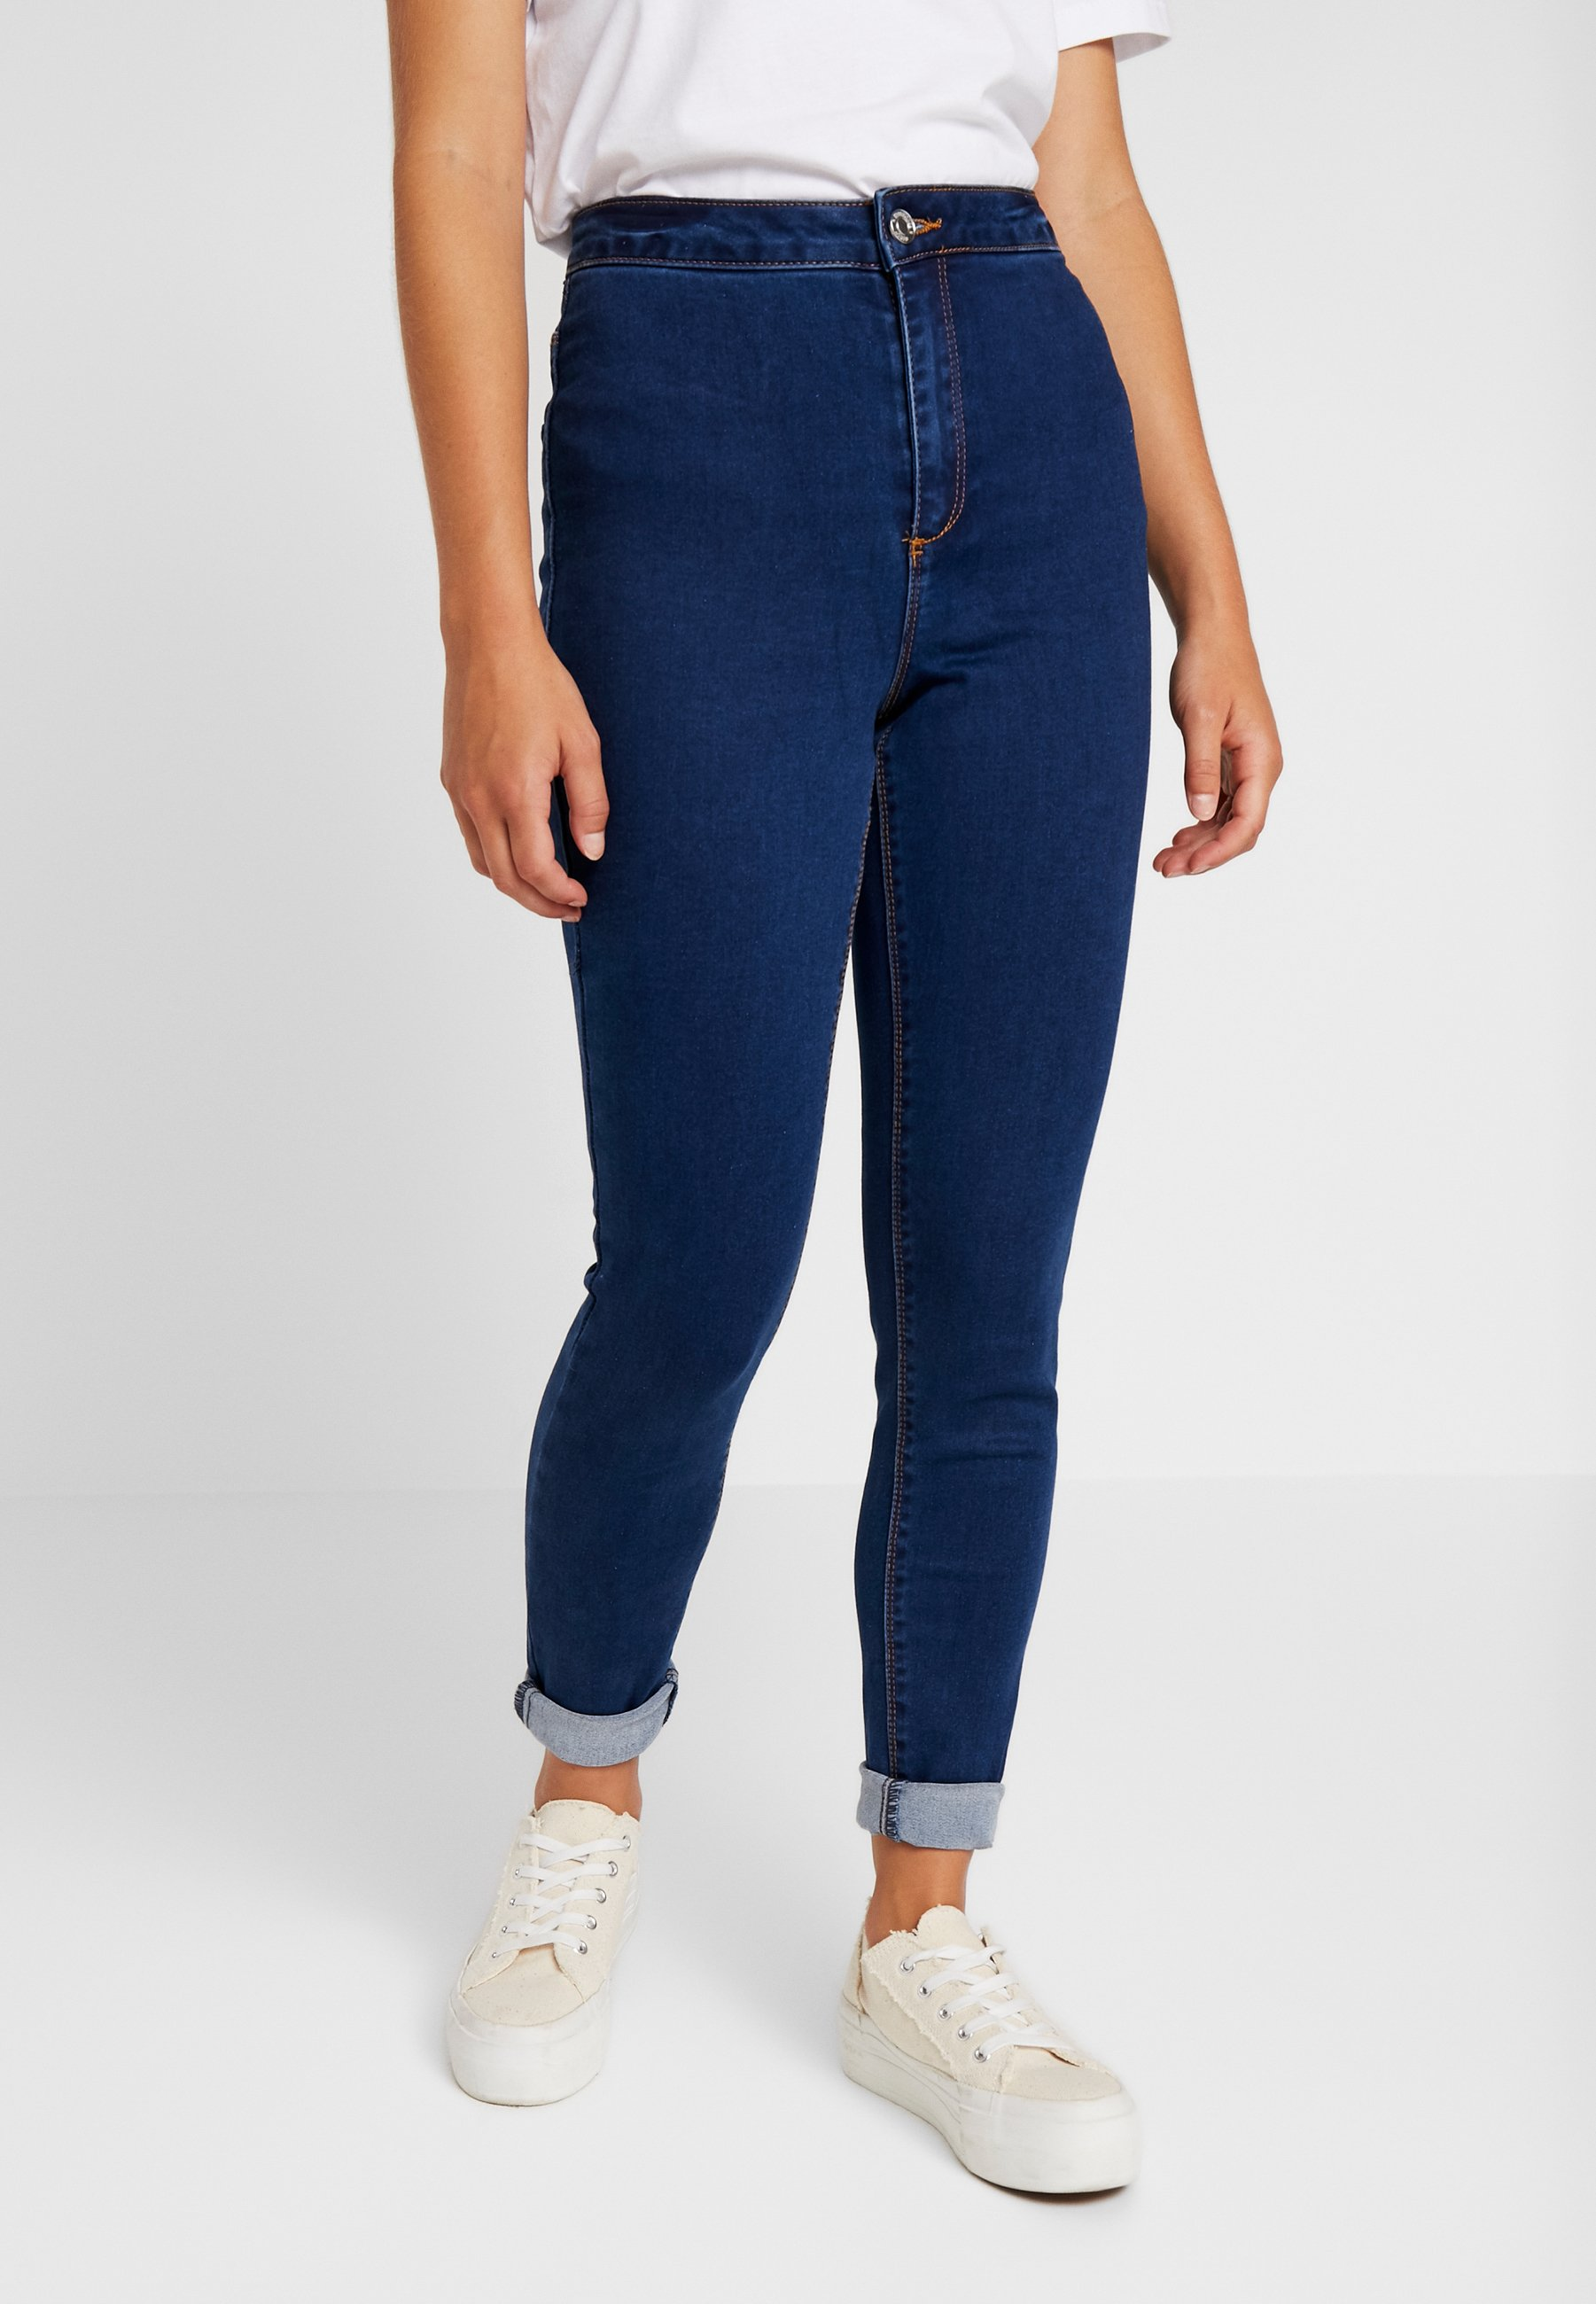 Petite Blue Dark HighwaistedJeans Missguided Vice Skinny 6gI7Ybfyv